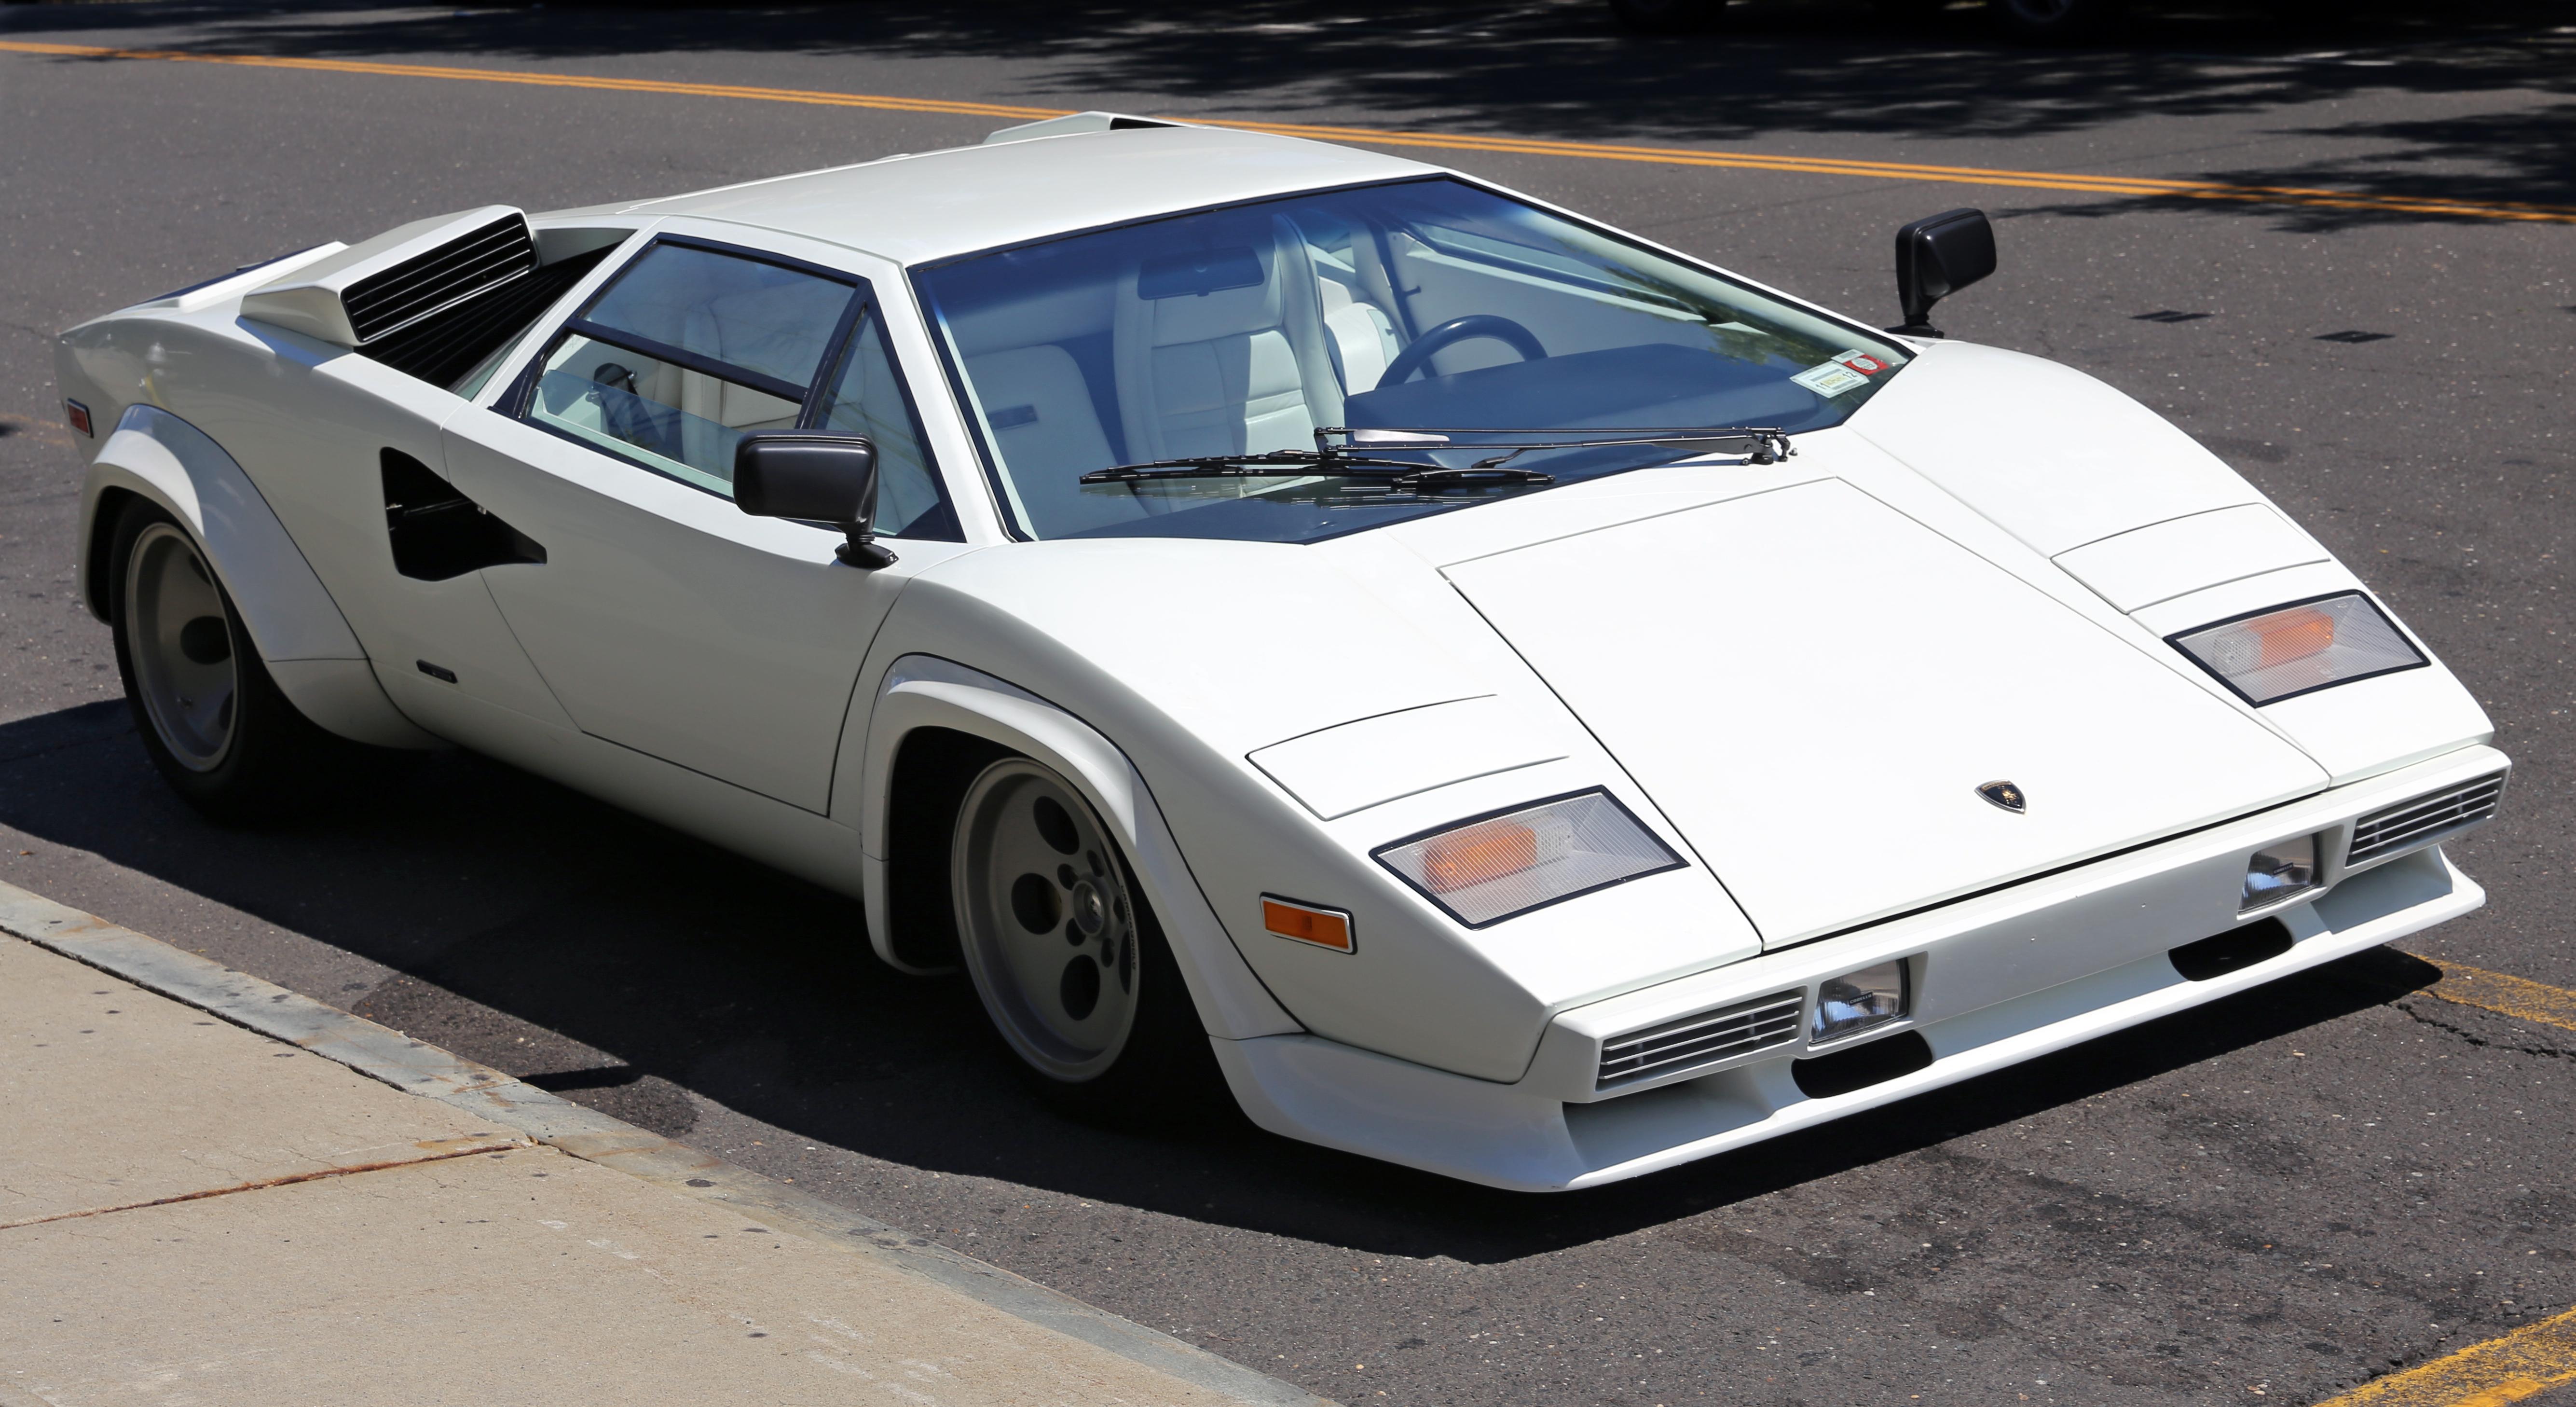 1981_Lamborghini_Countach_LP400S_%28S2%29_front Extraordinary Lamborghini Countach Schwer Zu Fahren Cars Trend